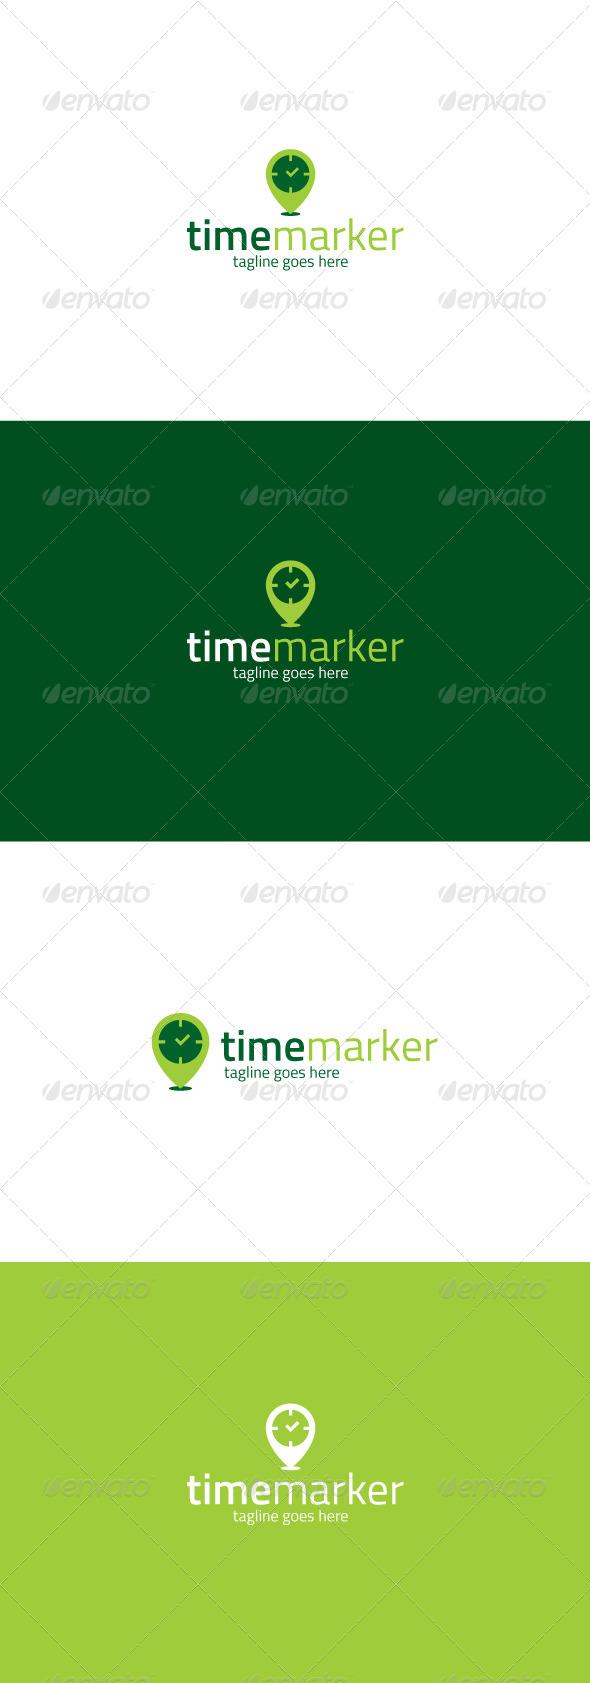 GraphicRiver Time Marker Logo 7731641